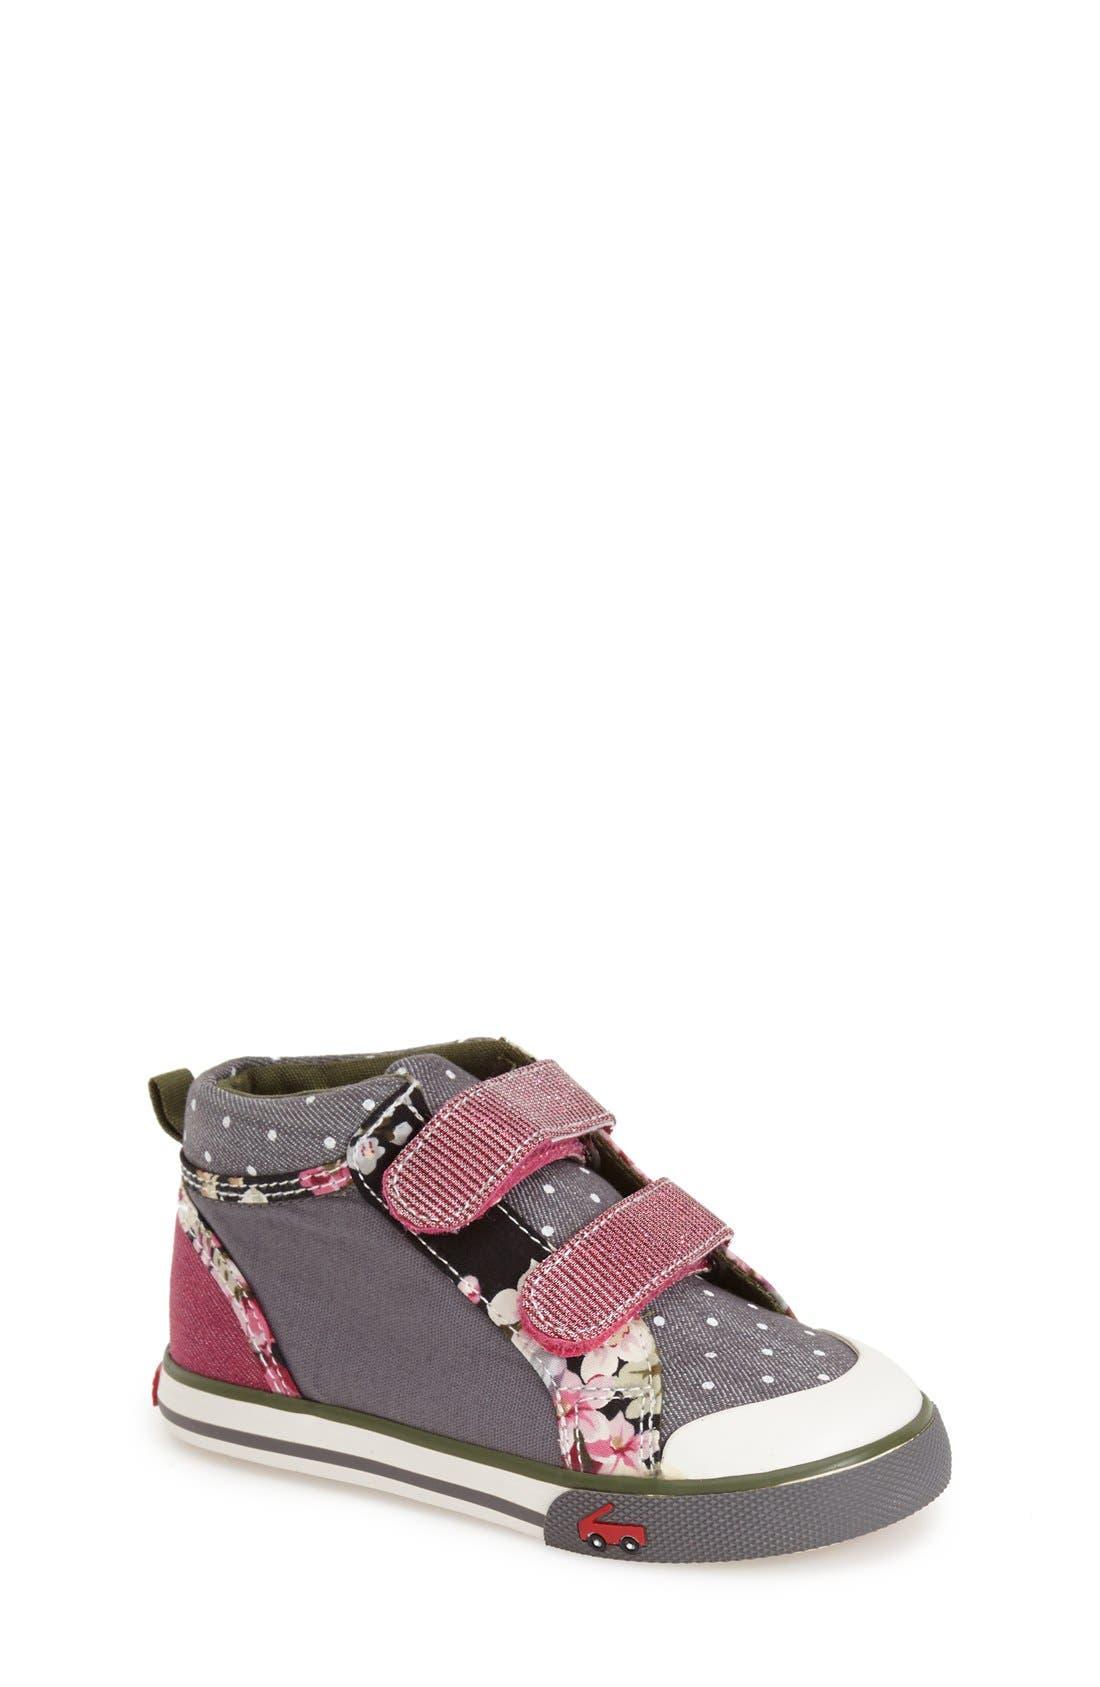 'Kya' High TopSneaker,                             Main thumbnail 1, color,                             020